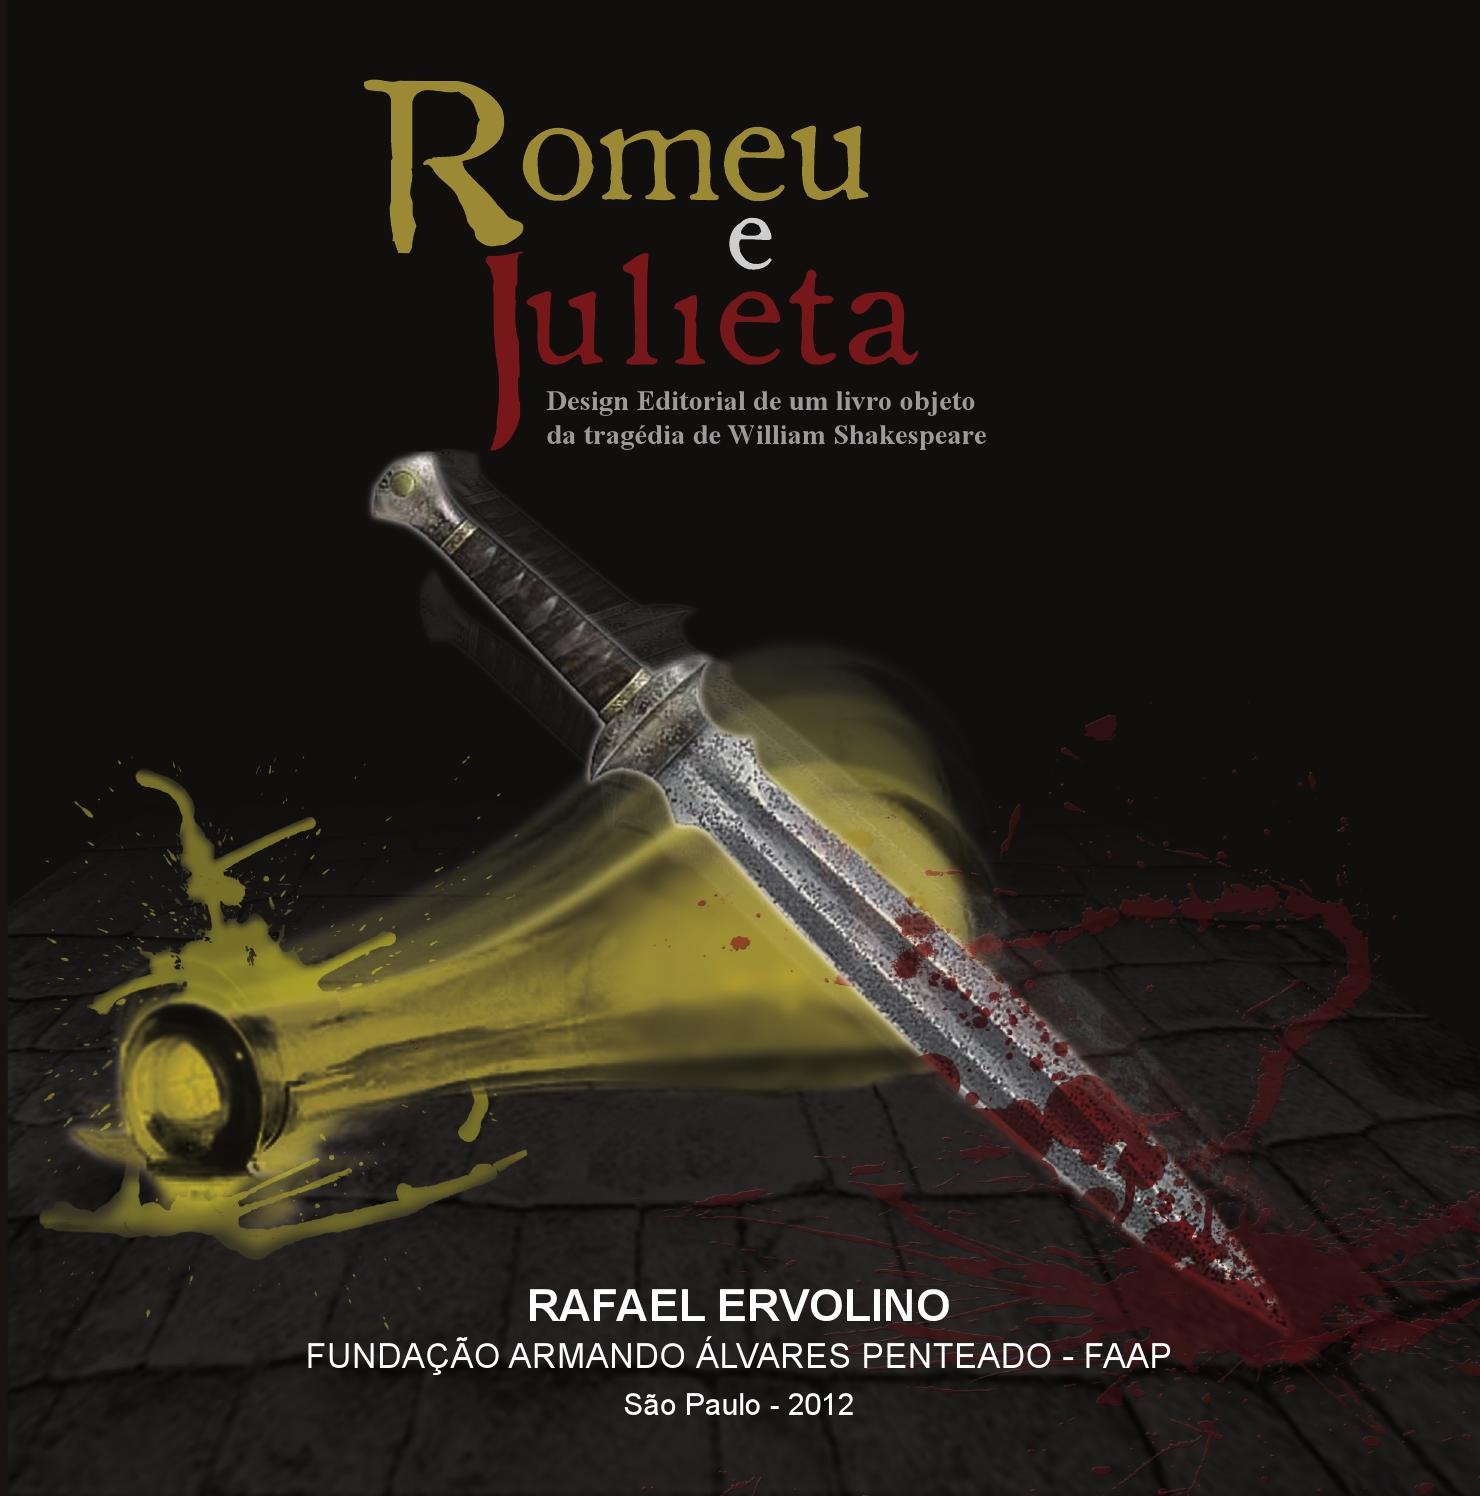 Romeu E Julieta Design Editorial Da Tragedia De William